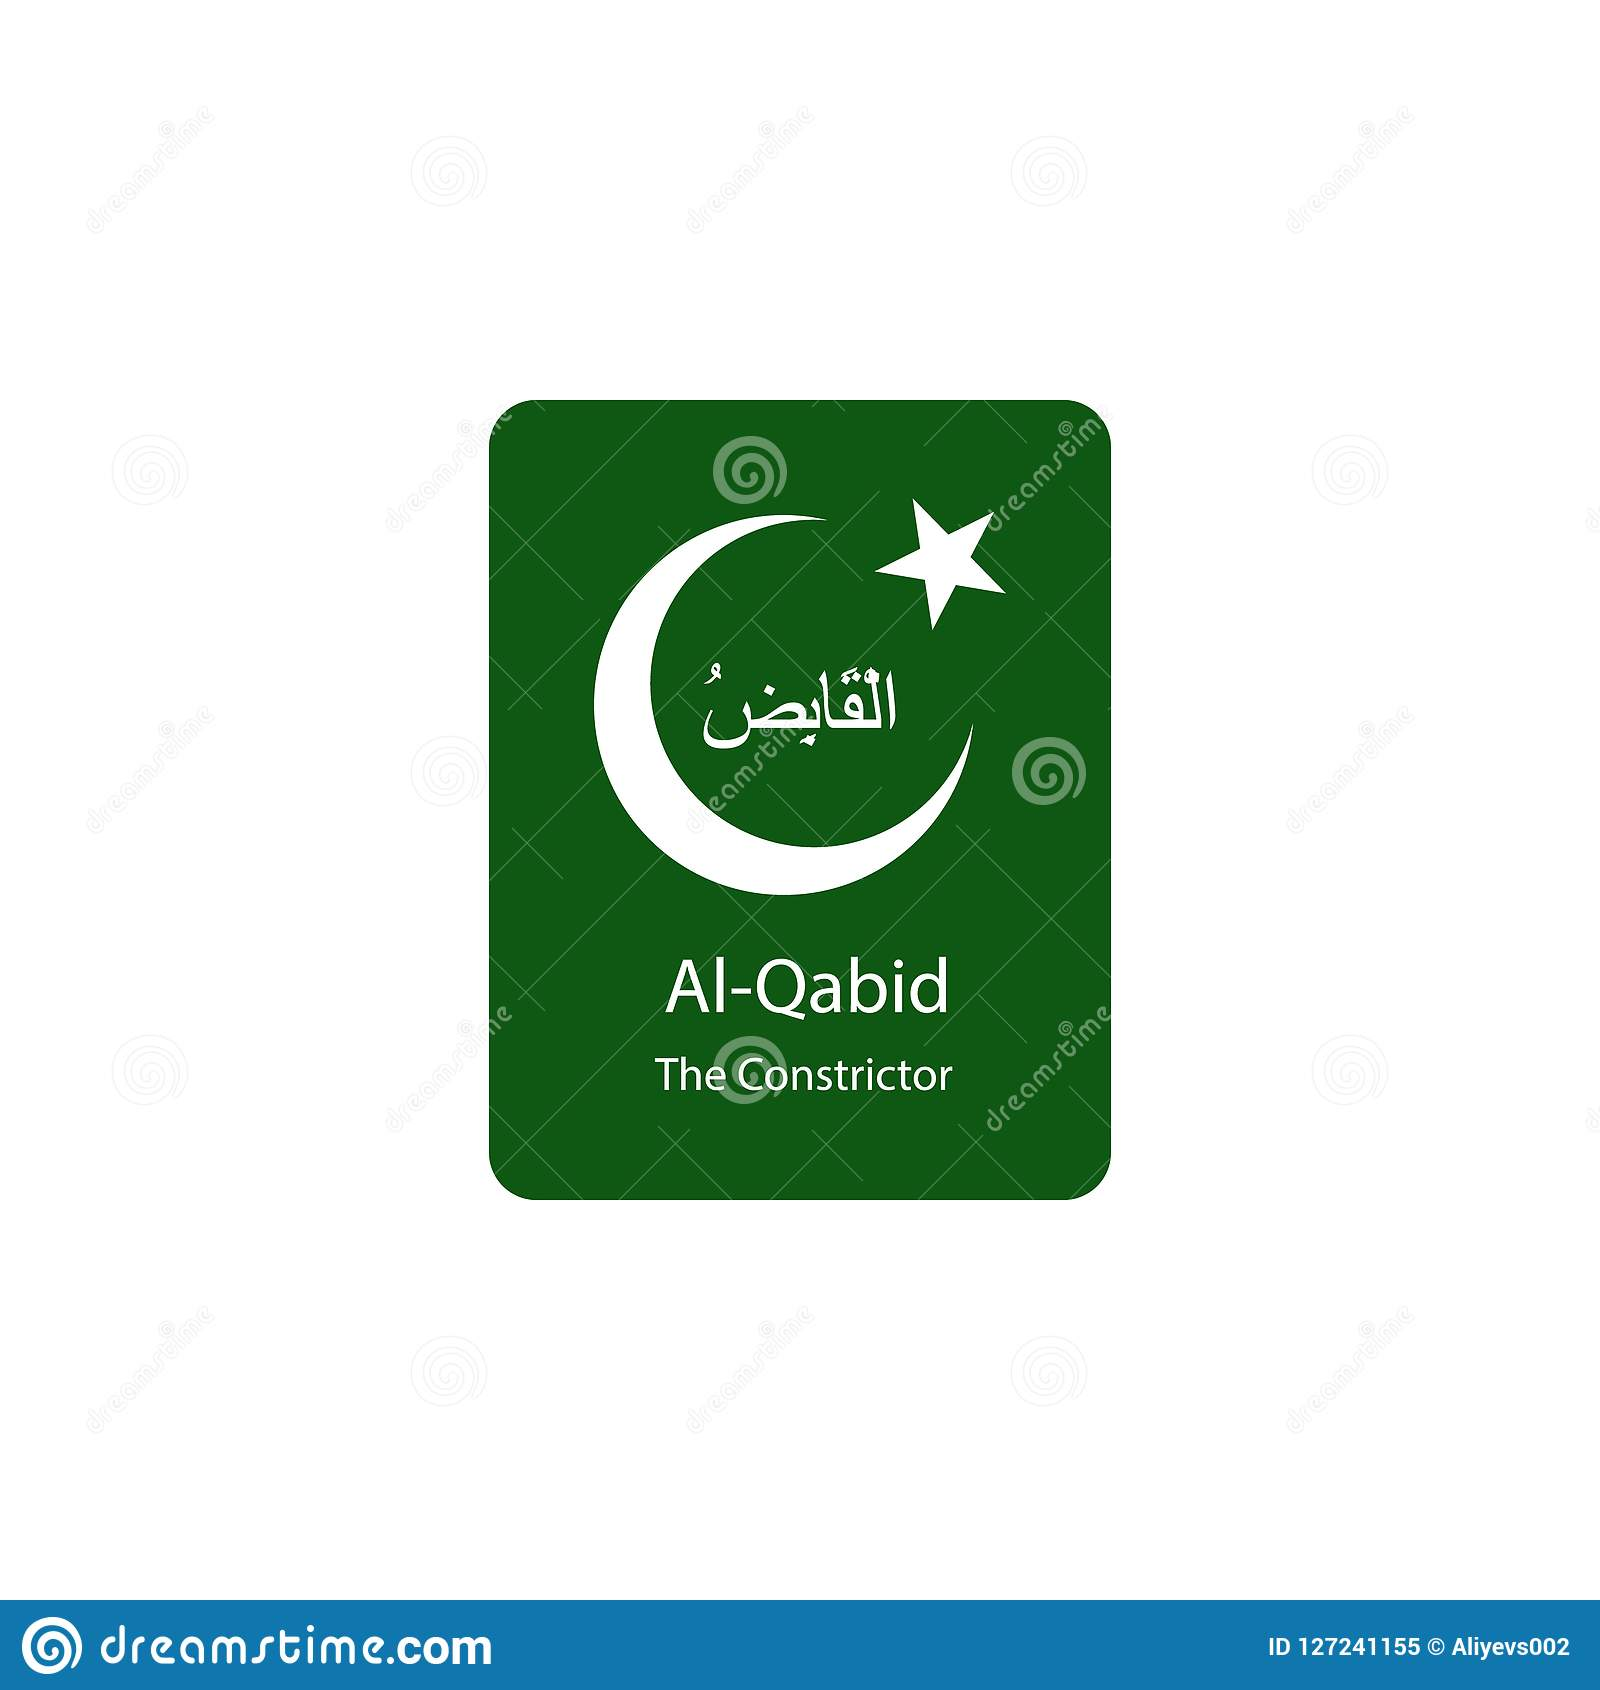 Al Qabid Allah Name In Arabic Writing In Green Background